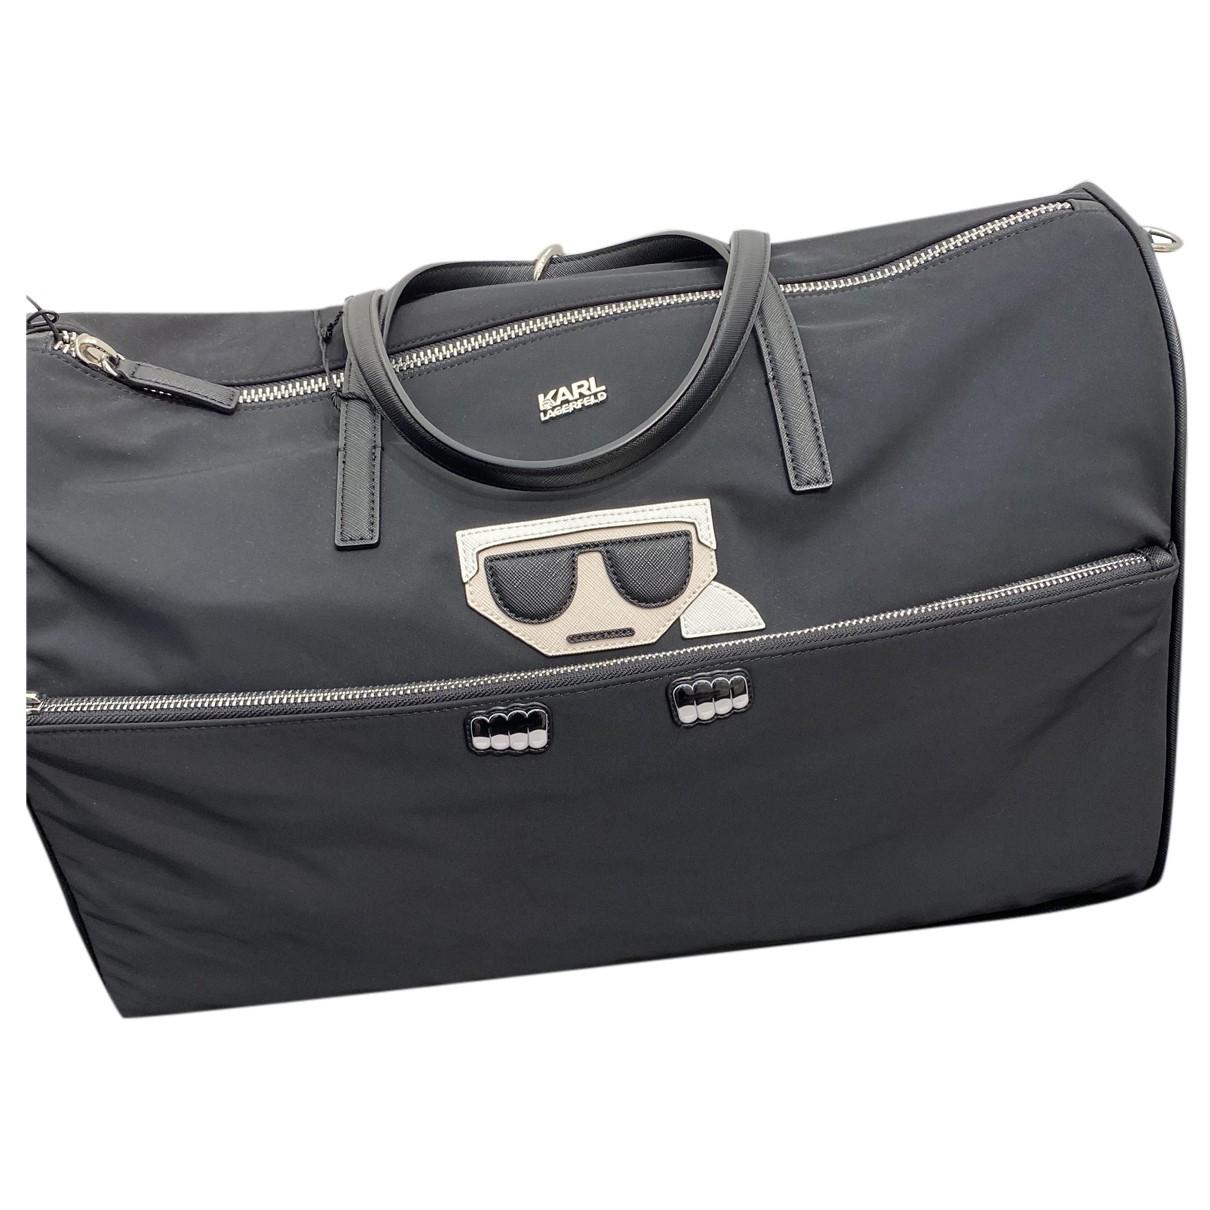 Bolso de viaje de Lona Karl Lagerfeld